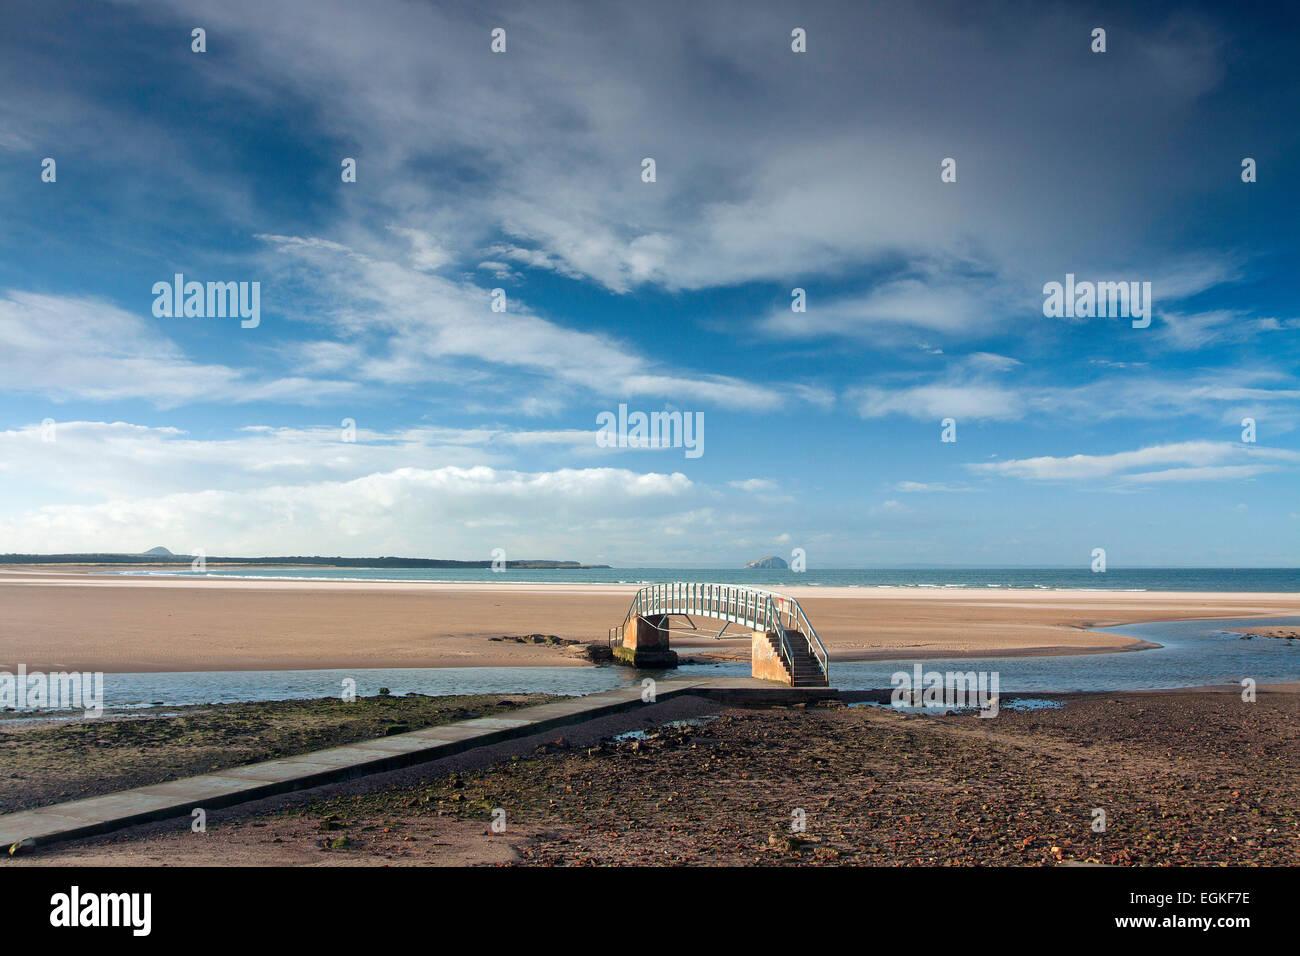 The Bridge to Nowhere, Belhaven Bay, John Muir Country Park, Dunbar, East Lothian - Stock Image